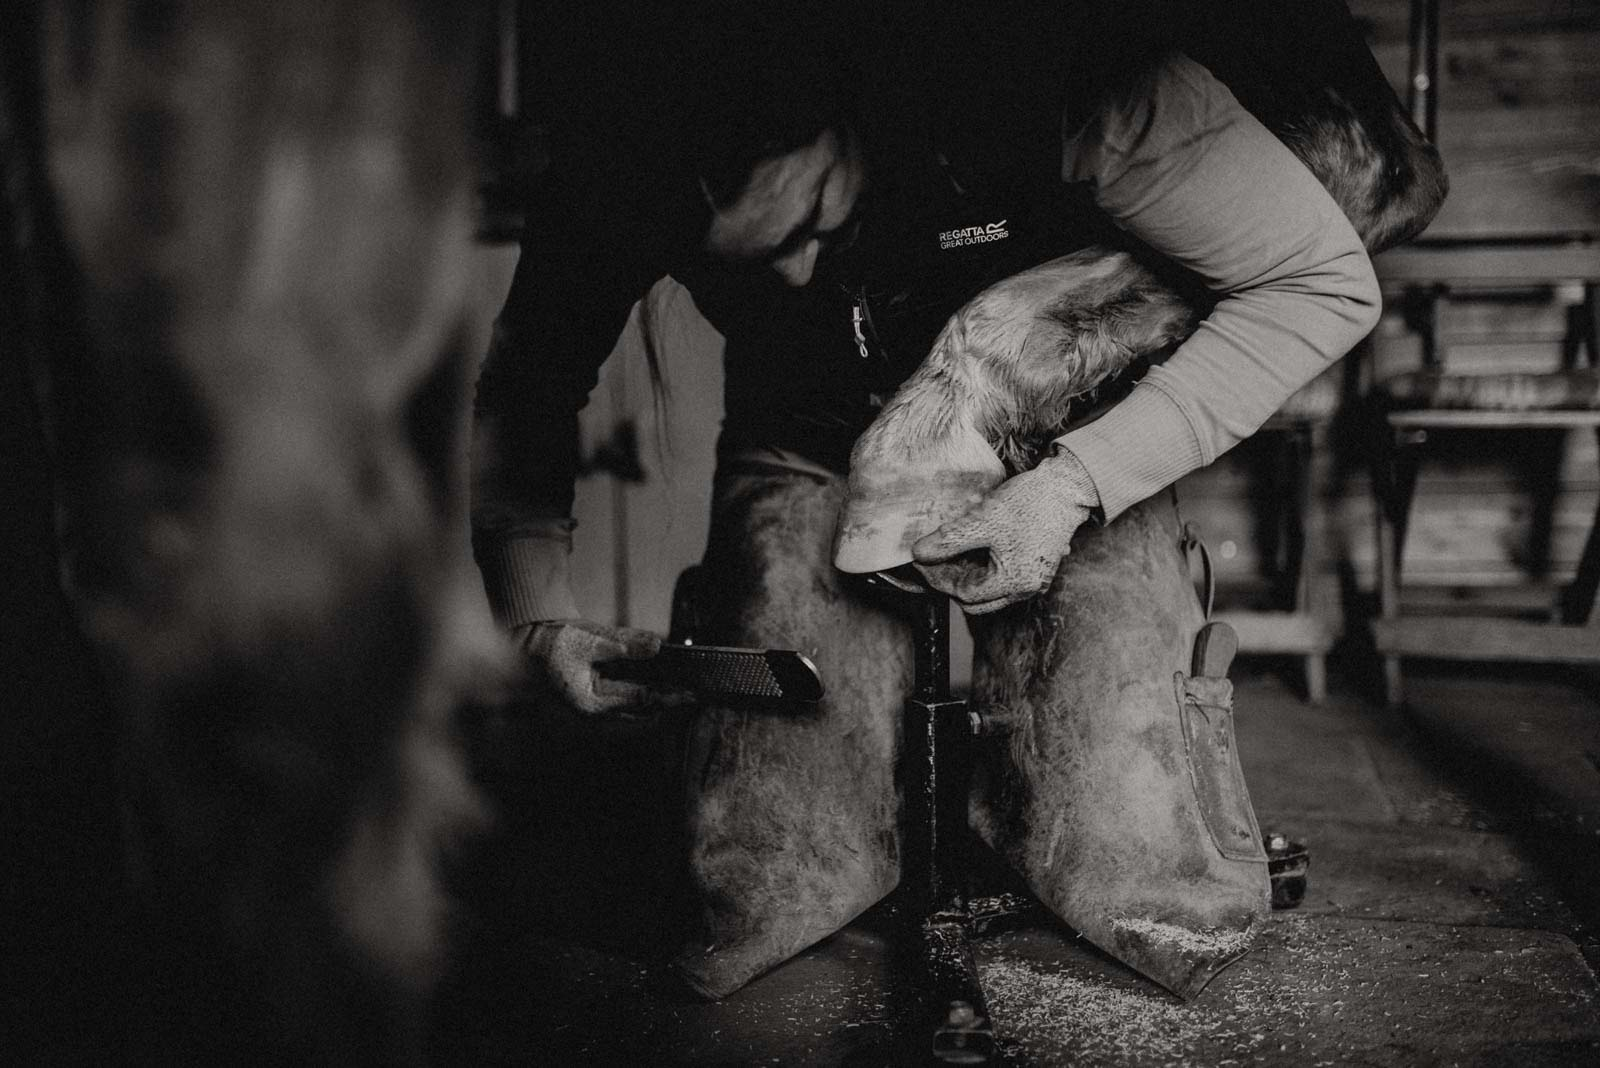 Barhufbearbeitung durch Huforthopädin der DIFHO